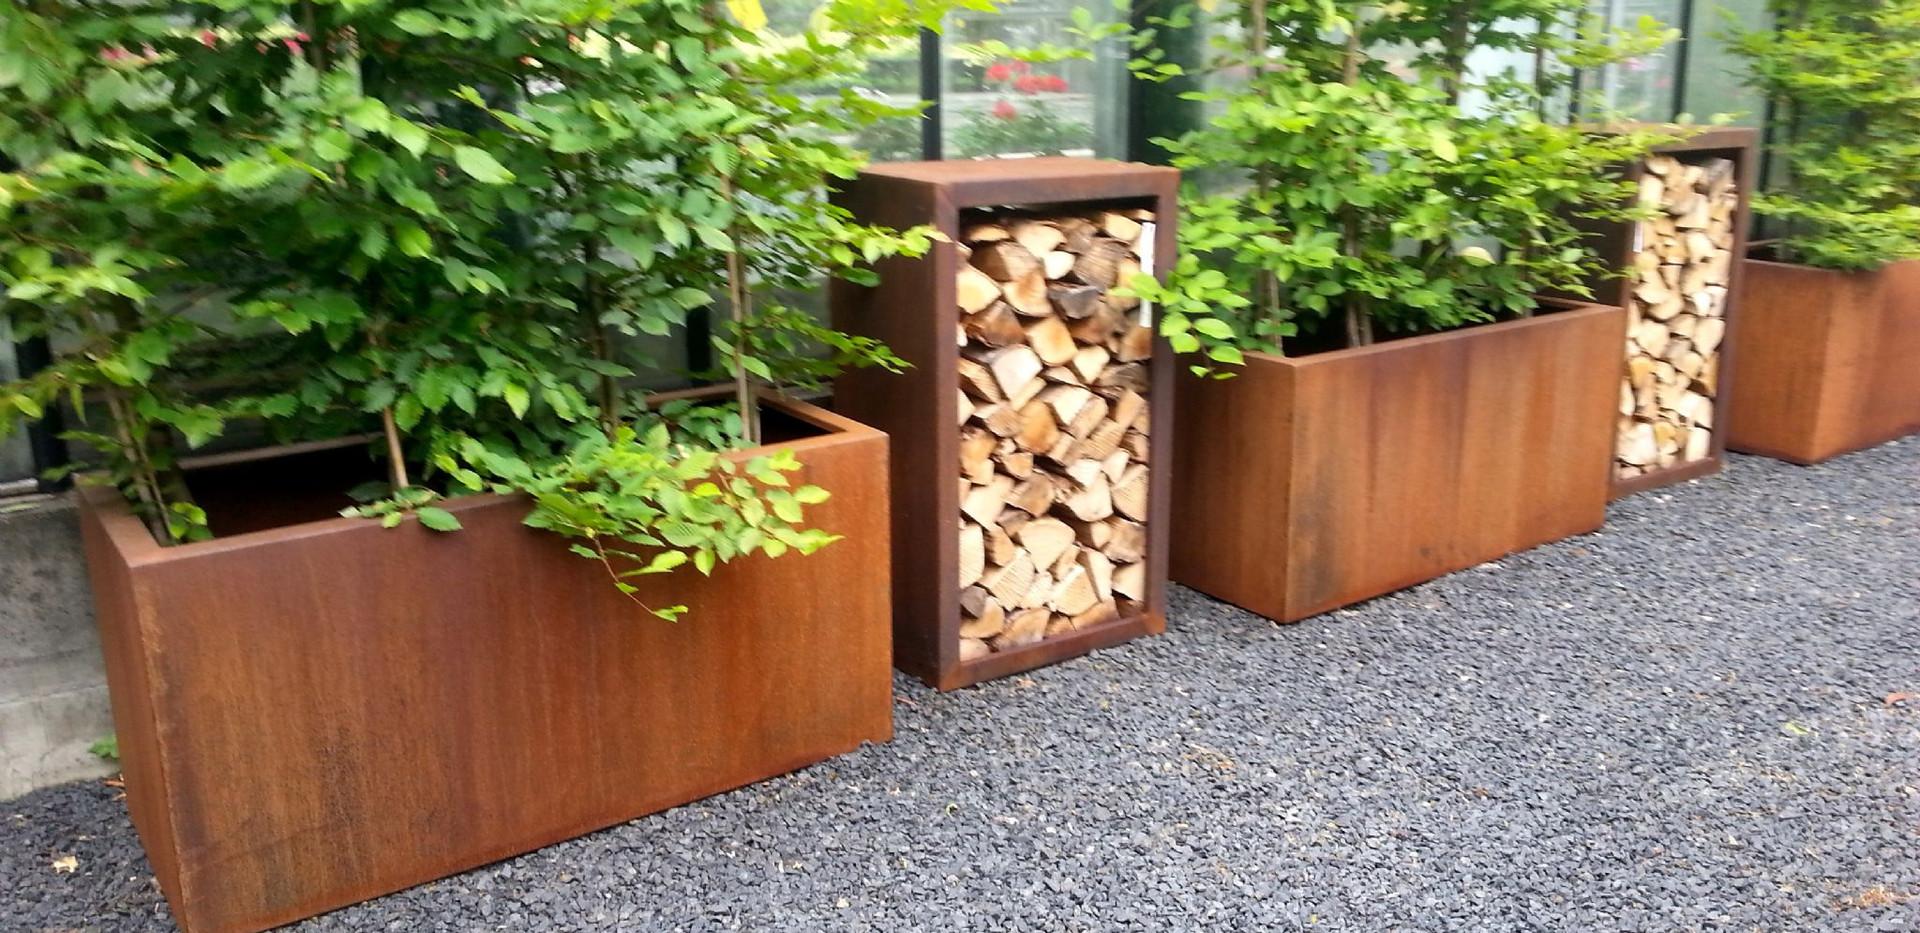 corten-steel-trough-planters-28099-p.jpg